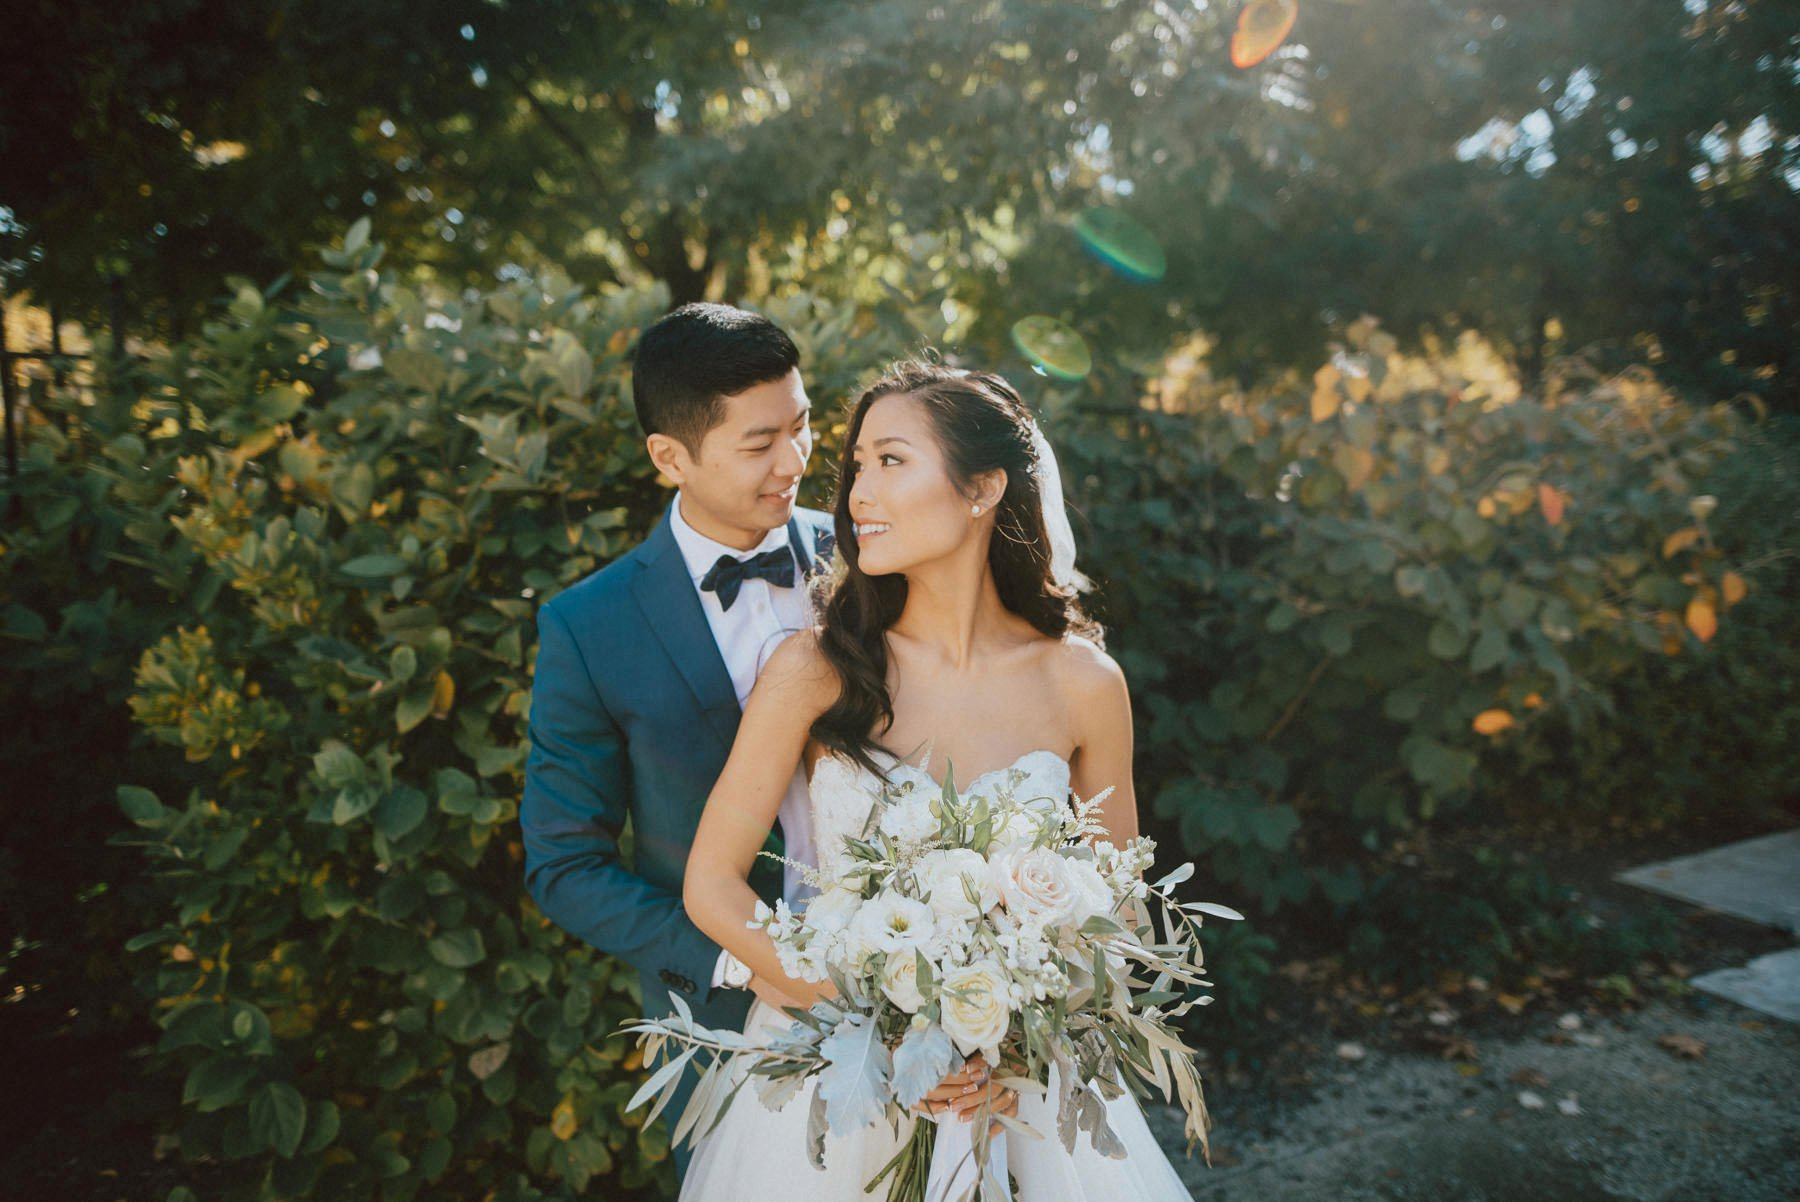 philadelphia-wedding-photographer-60.jpg